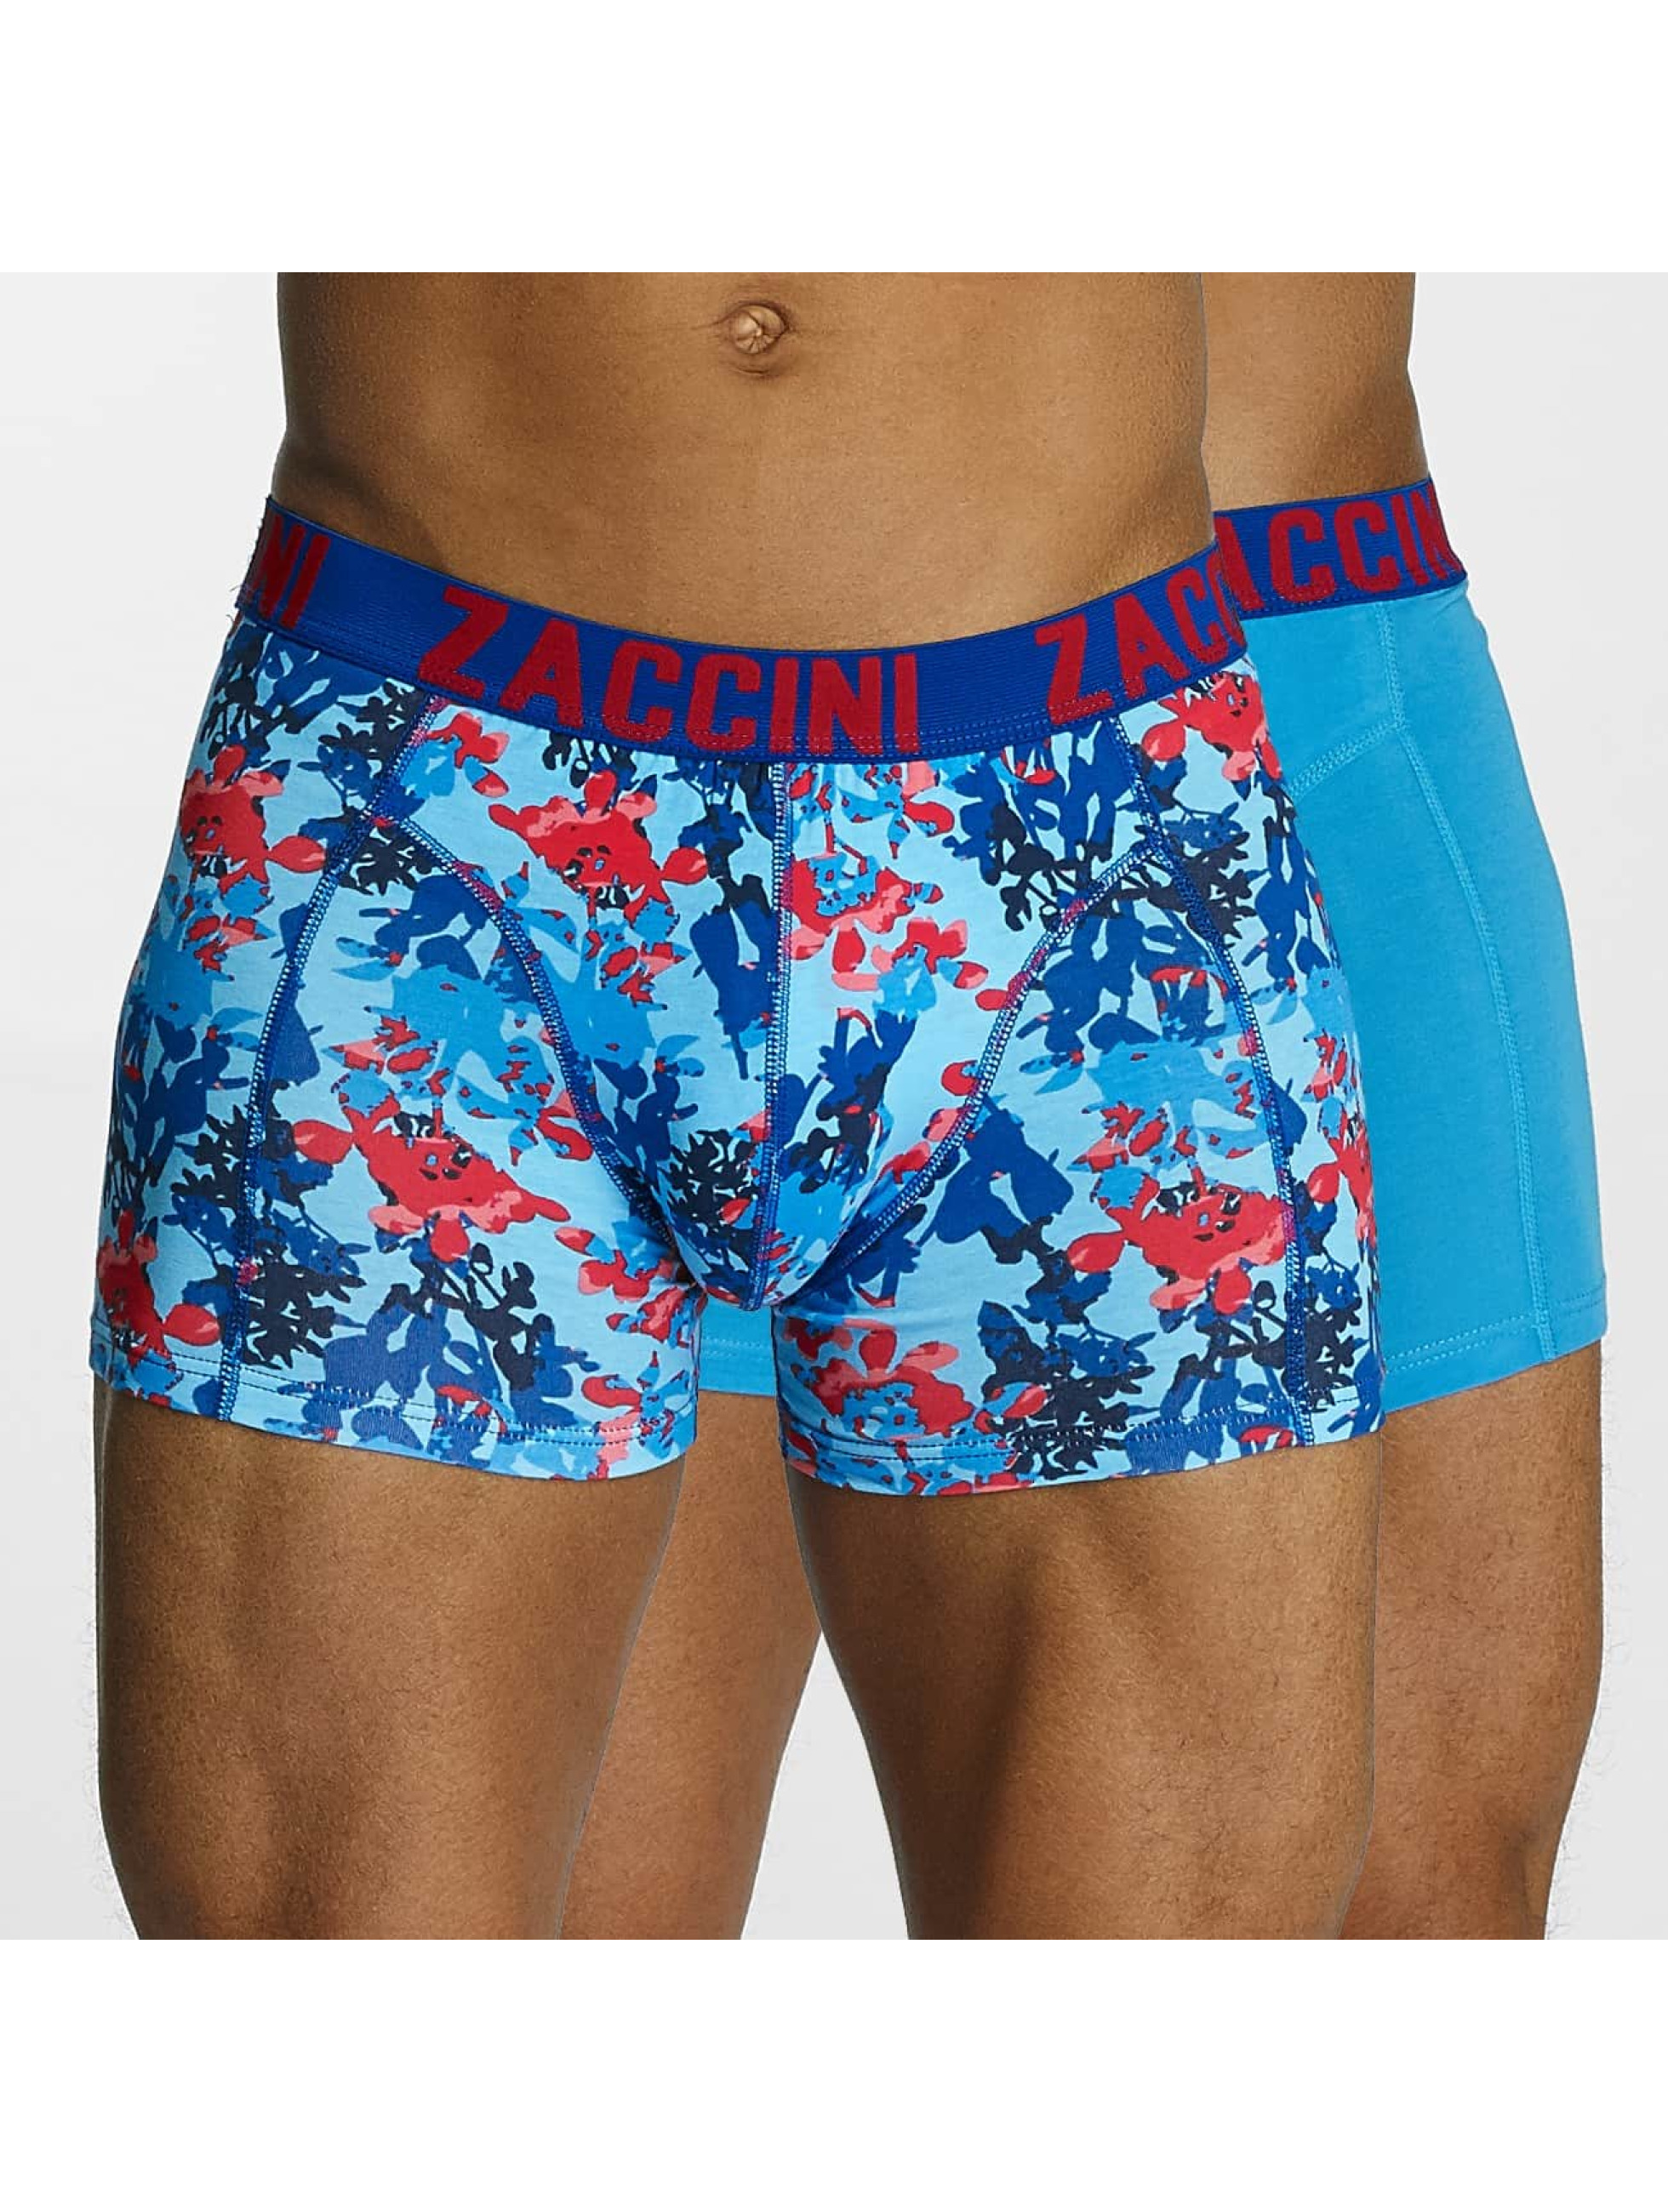 Zaccini Boxer Painted Spring bleu